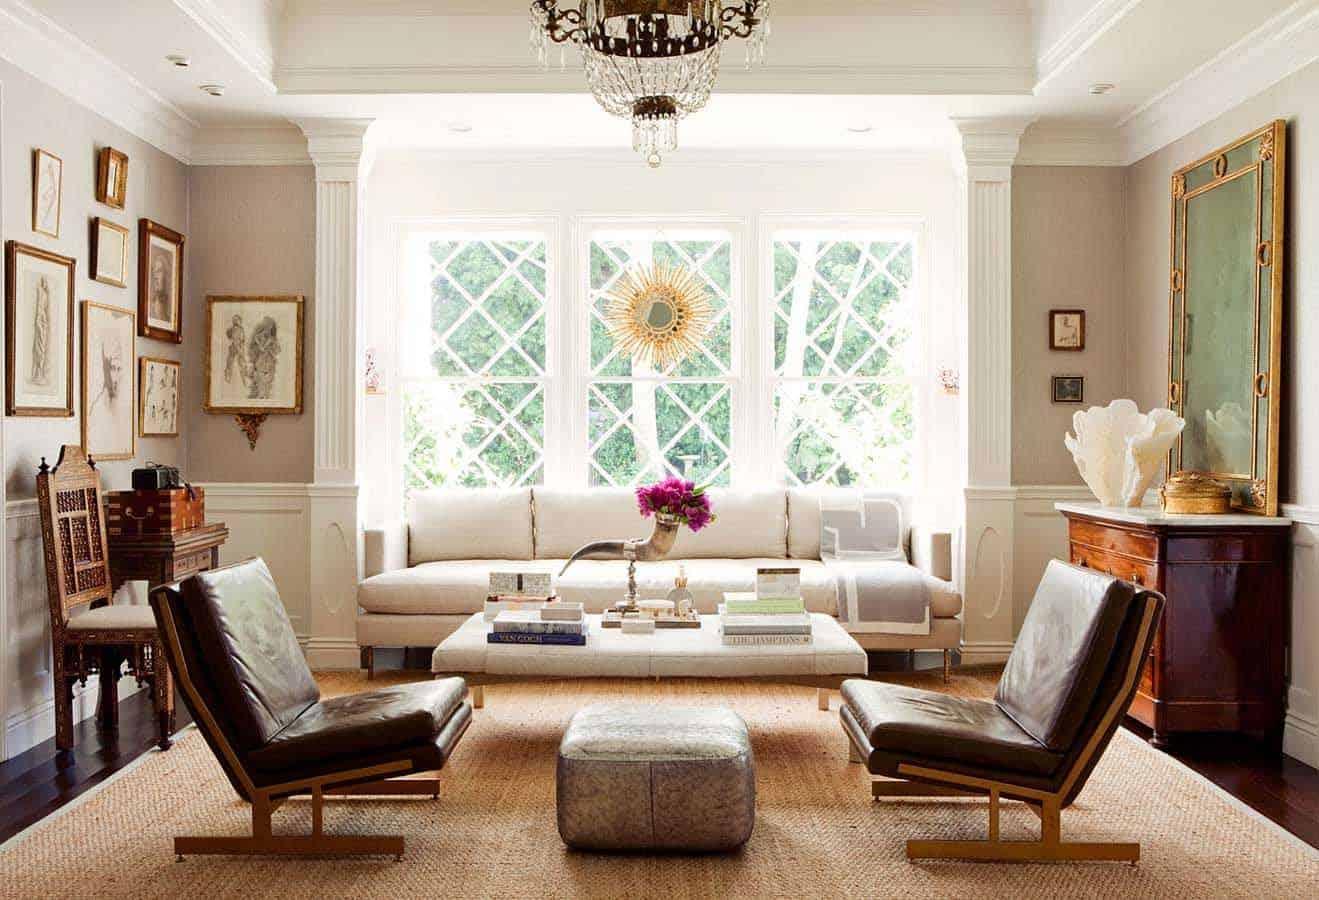 Arranging Living Room Furniture Kristina Wolf Design inside How To Rearrange Your Living Room